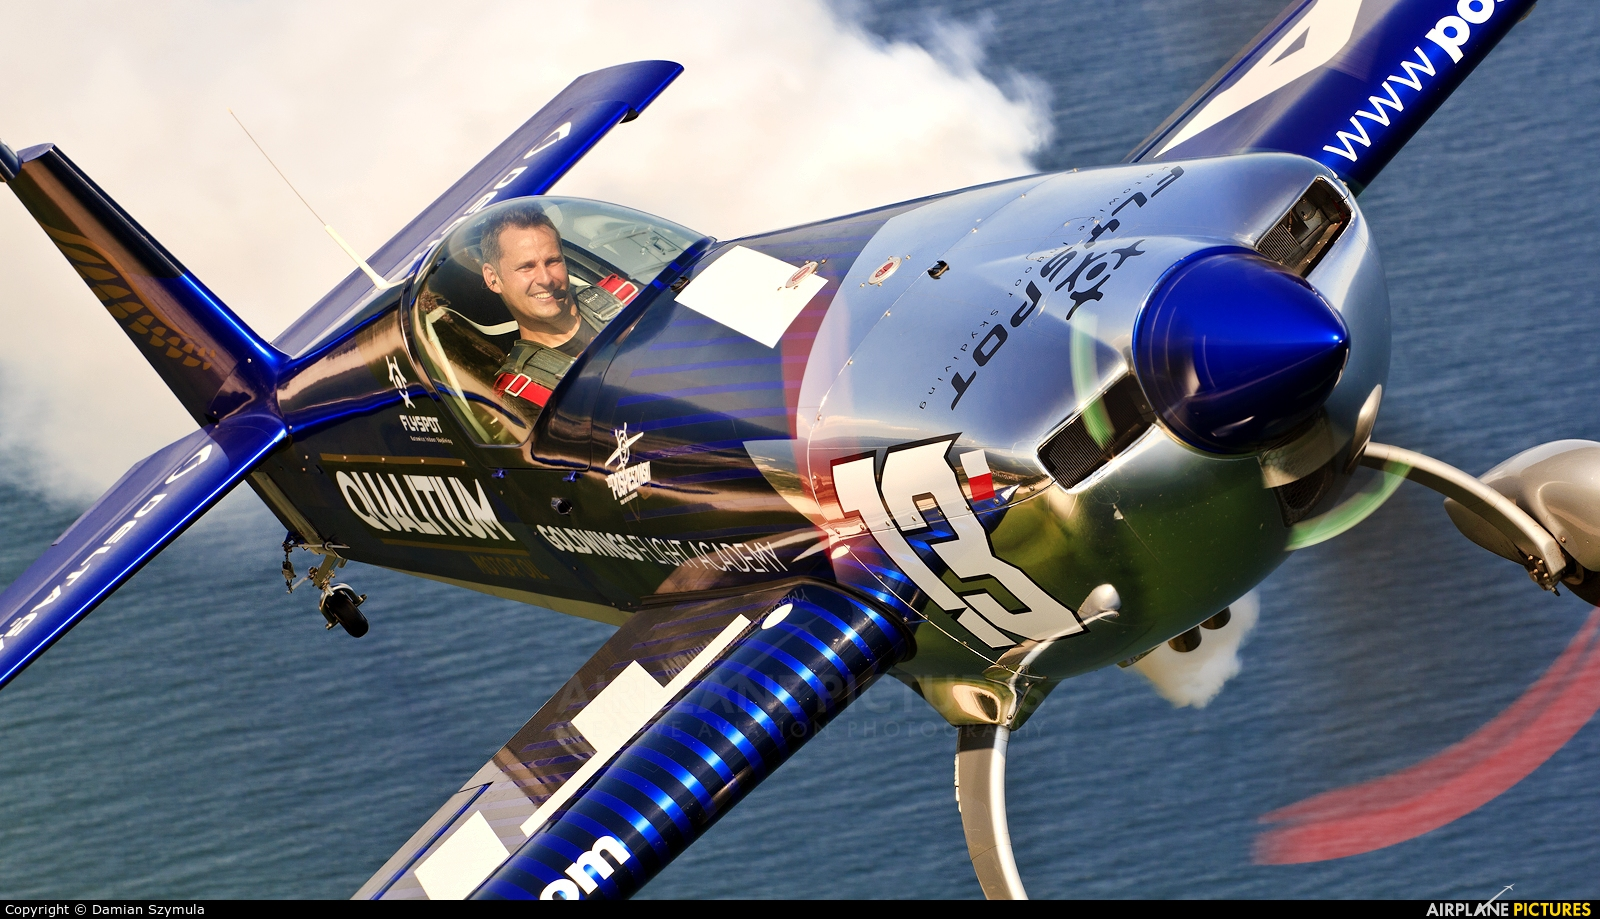 Maciej Pospieszyński - Aerobatics SP-YOO aircraft at In Flight - Poland